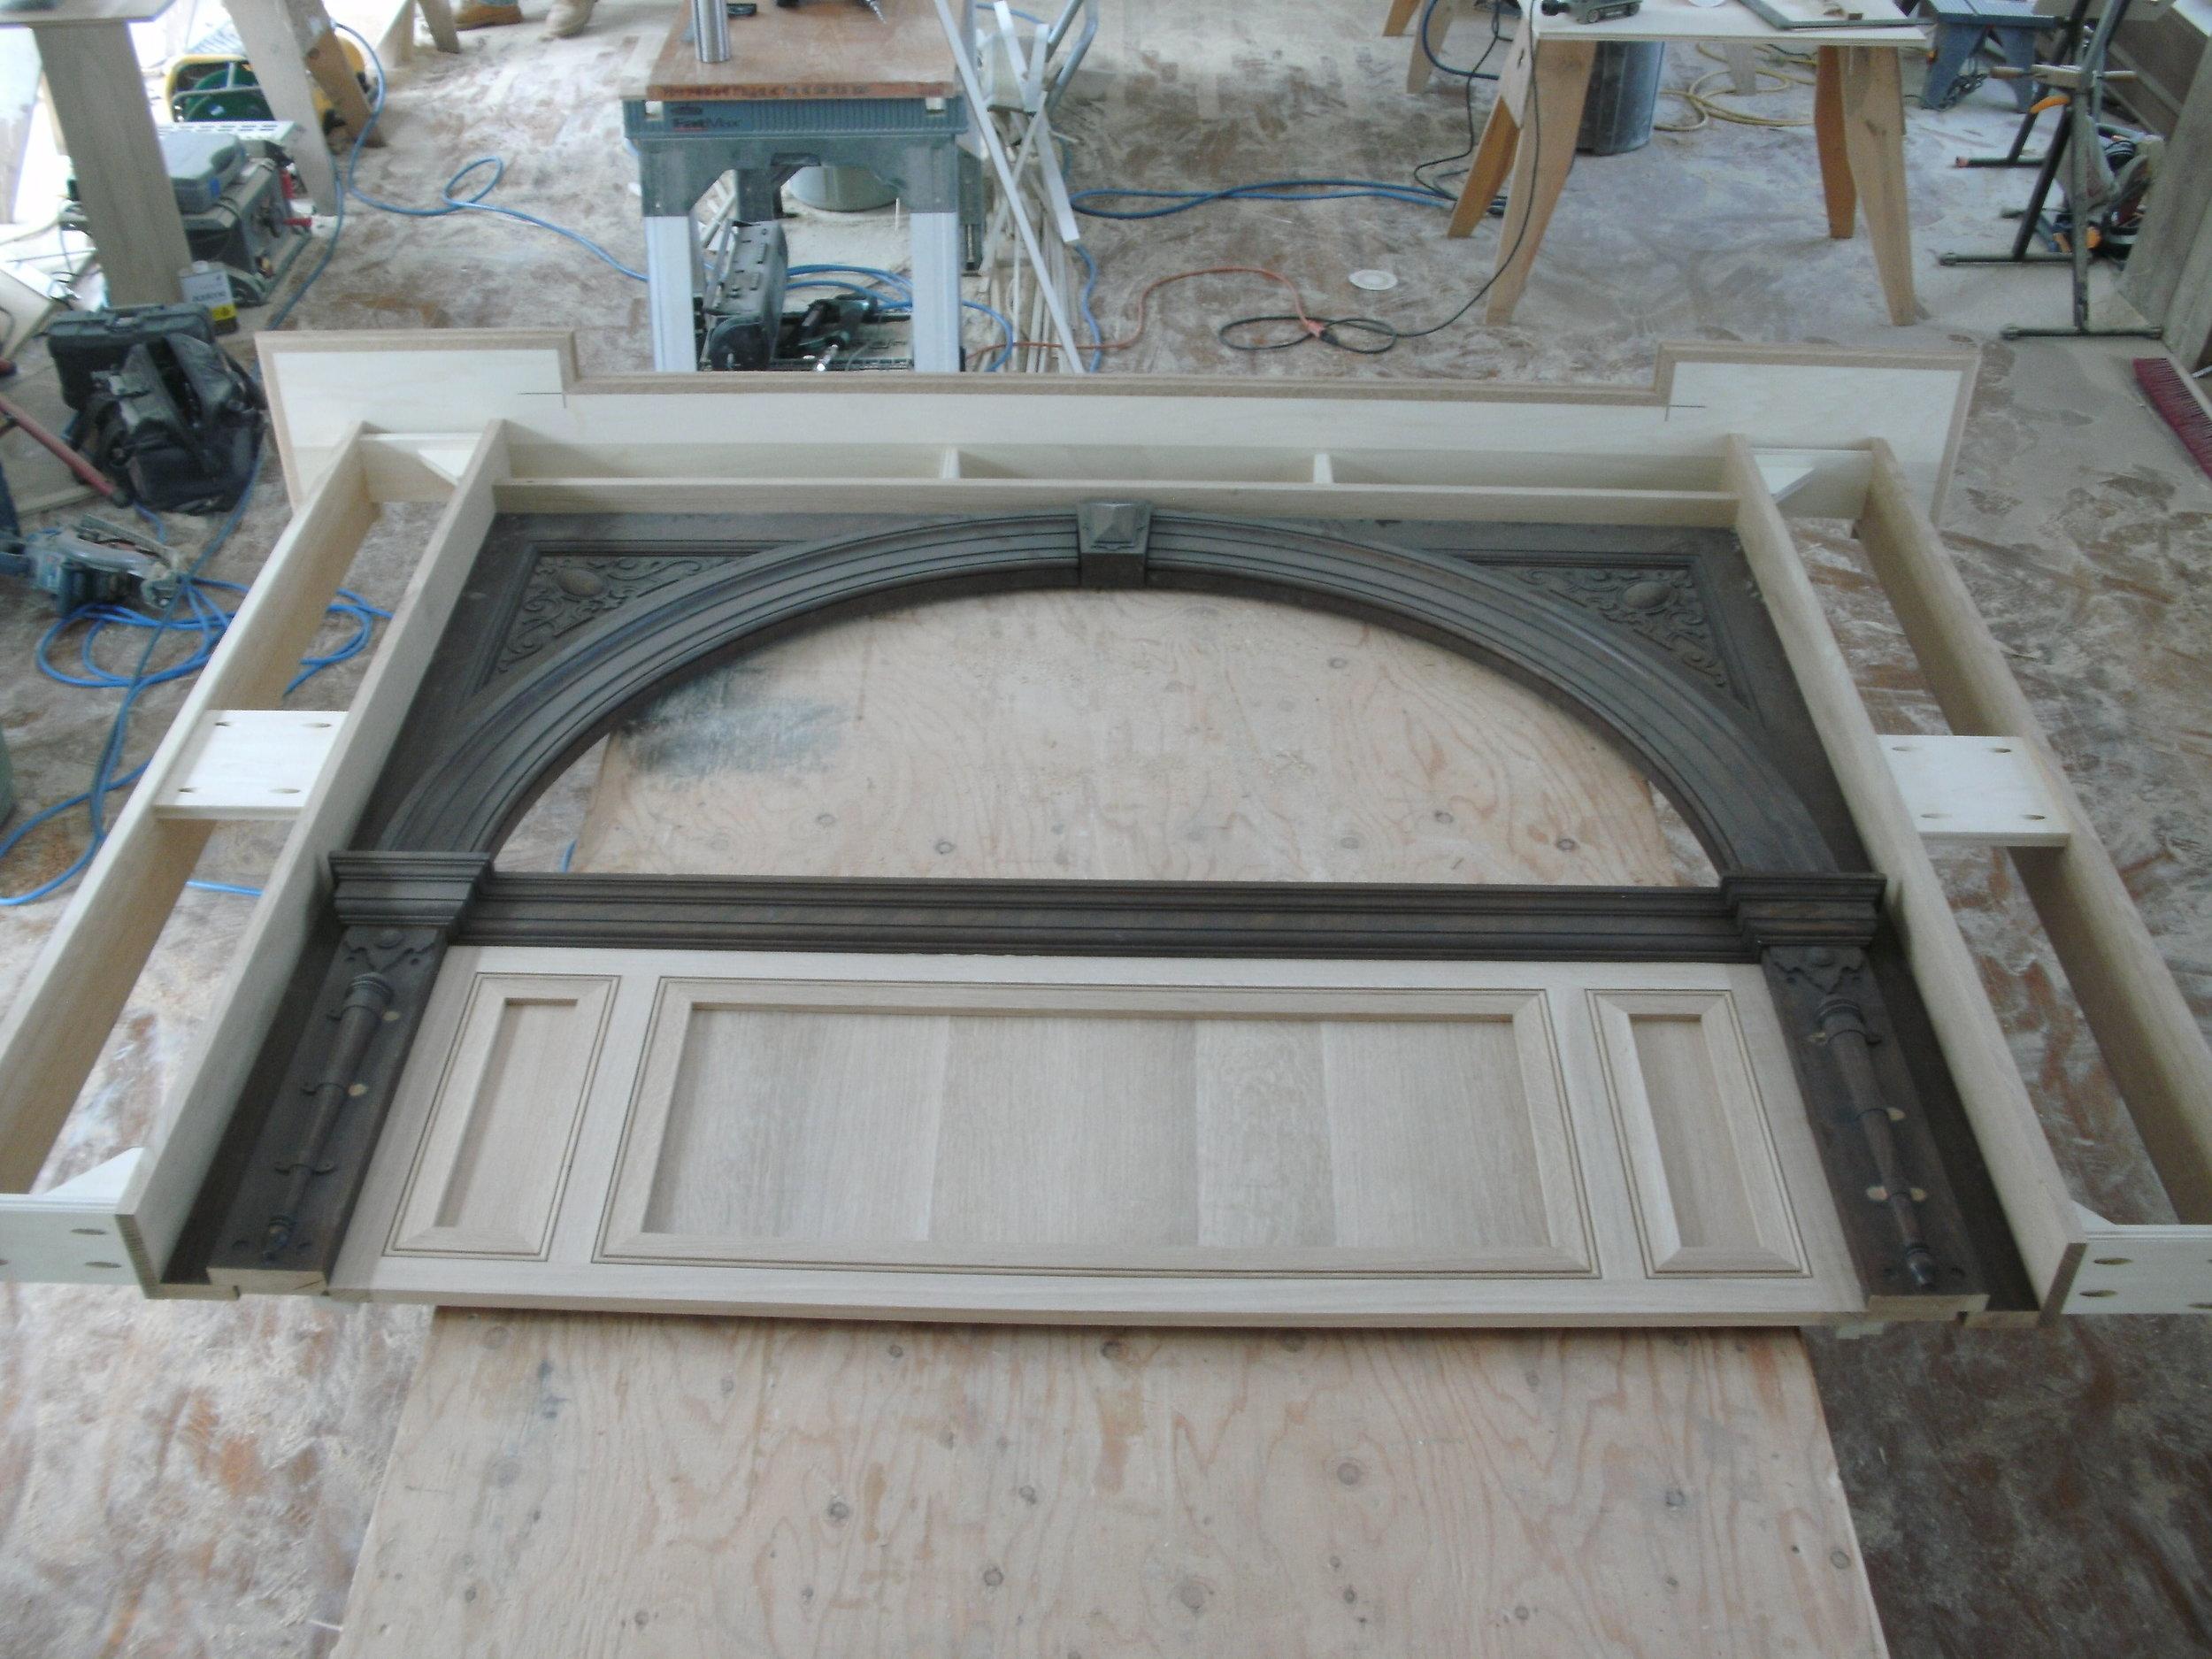 Center Panel Installed on Original Woodworking